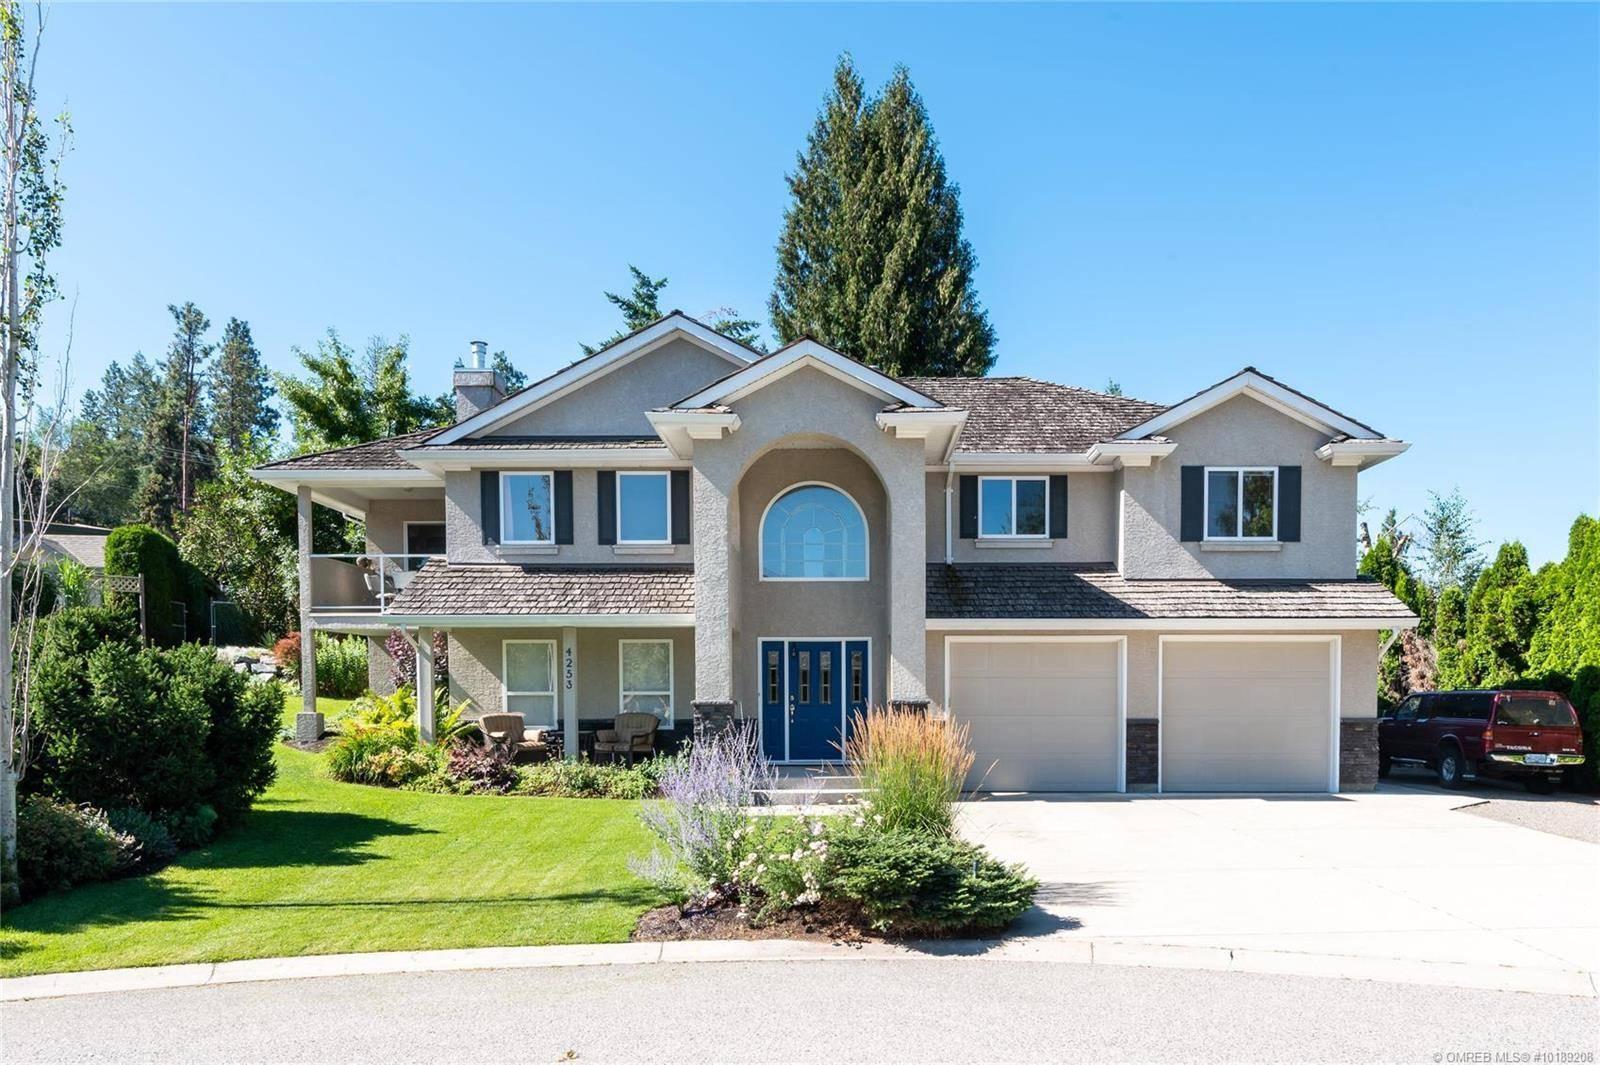 House for sale at 4253 Eso Ct Kelowna British Columbia - MLS: 10189208